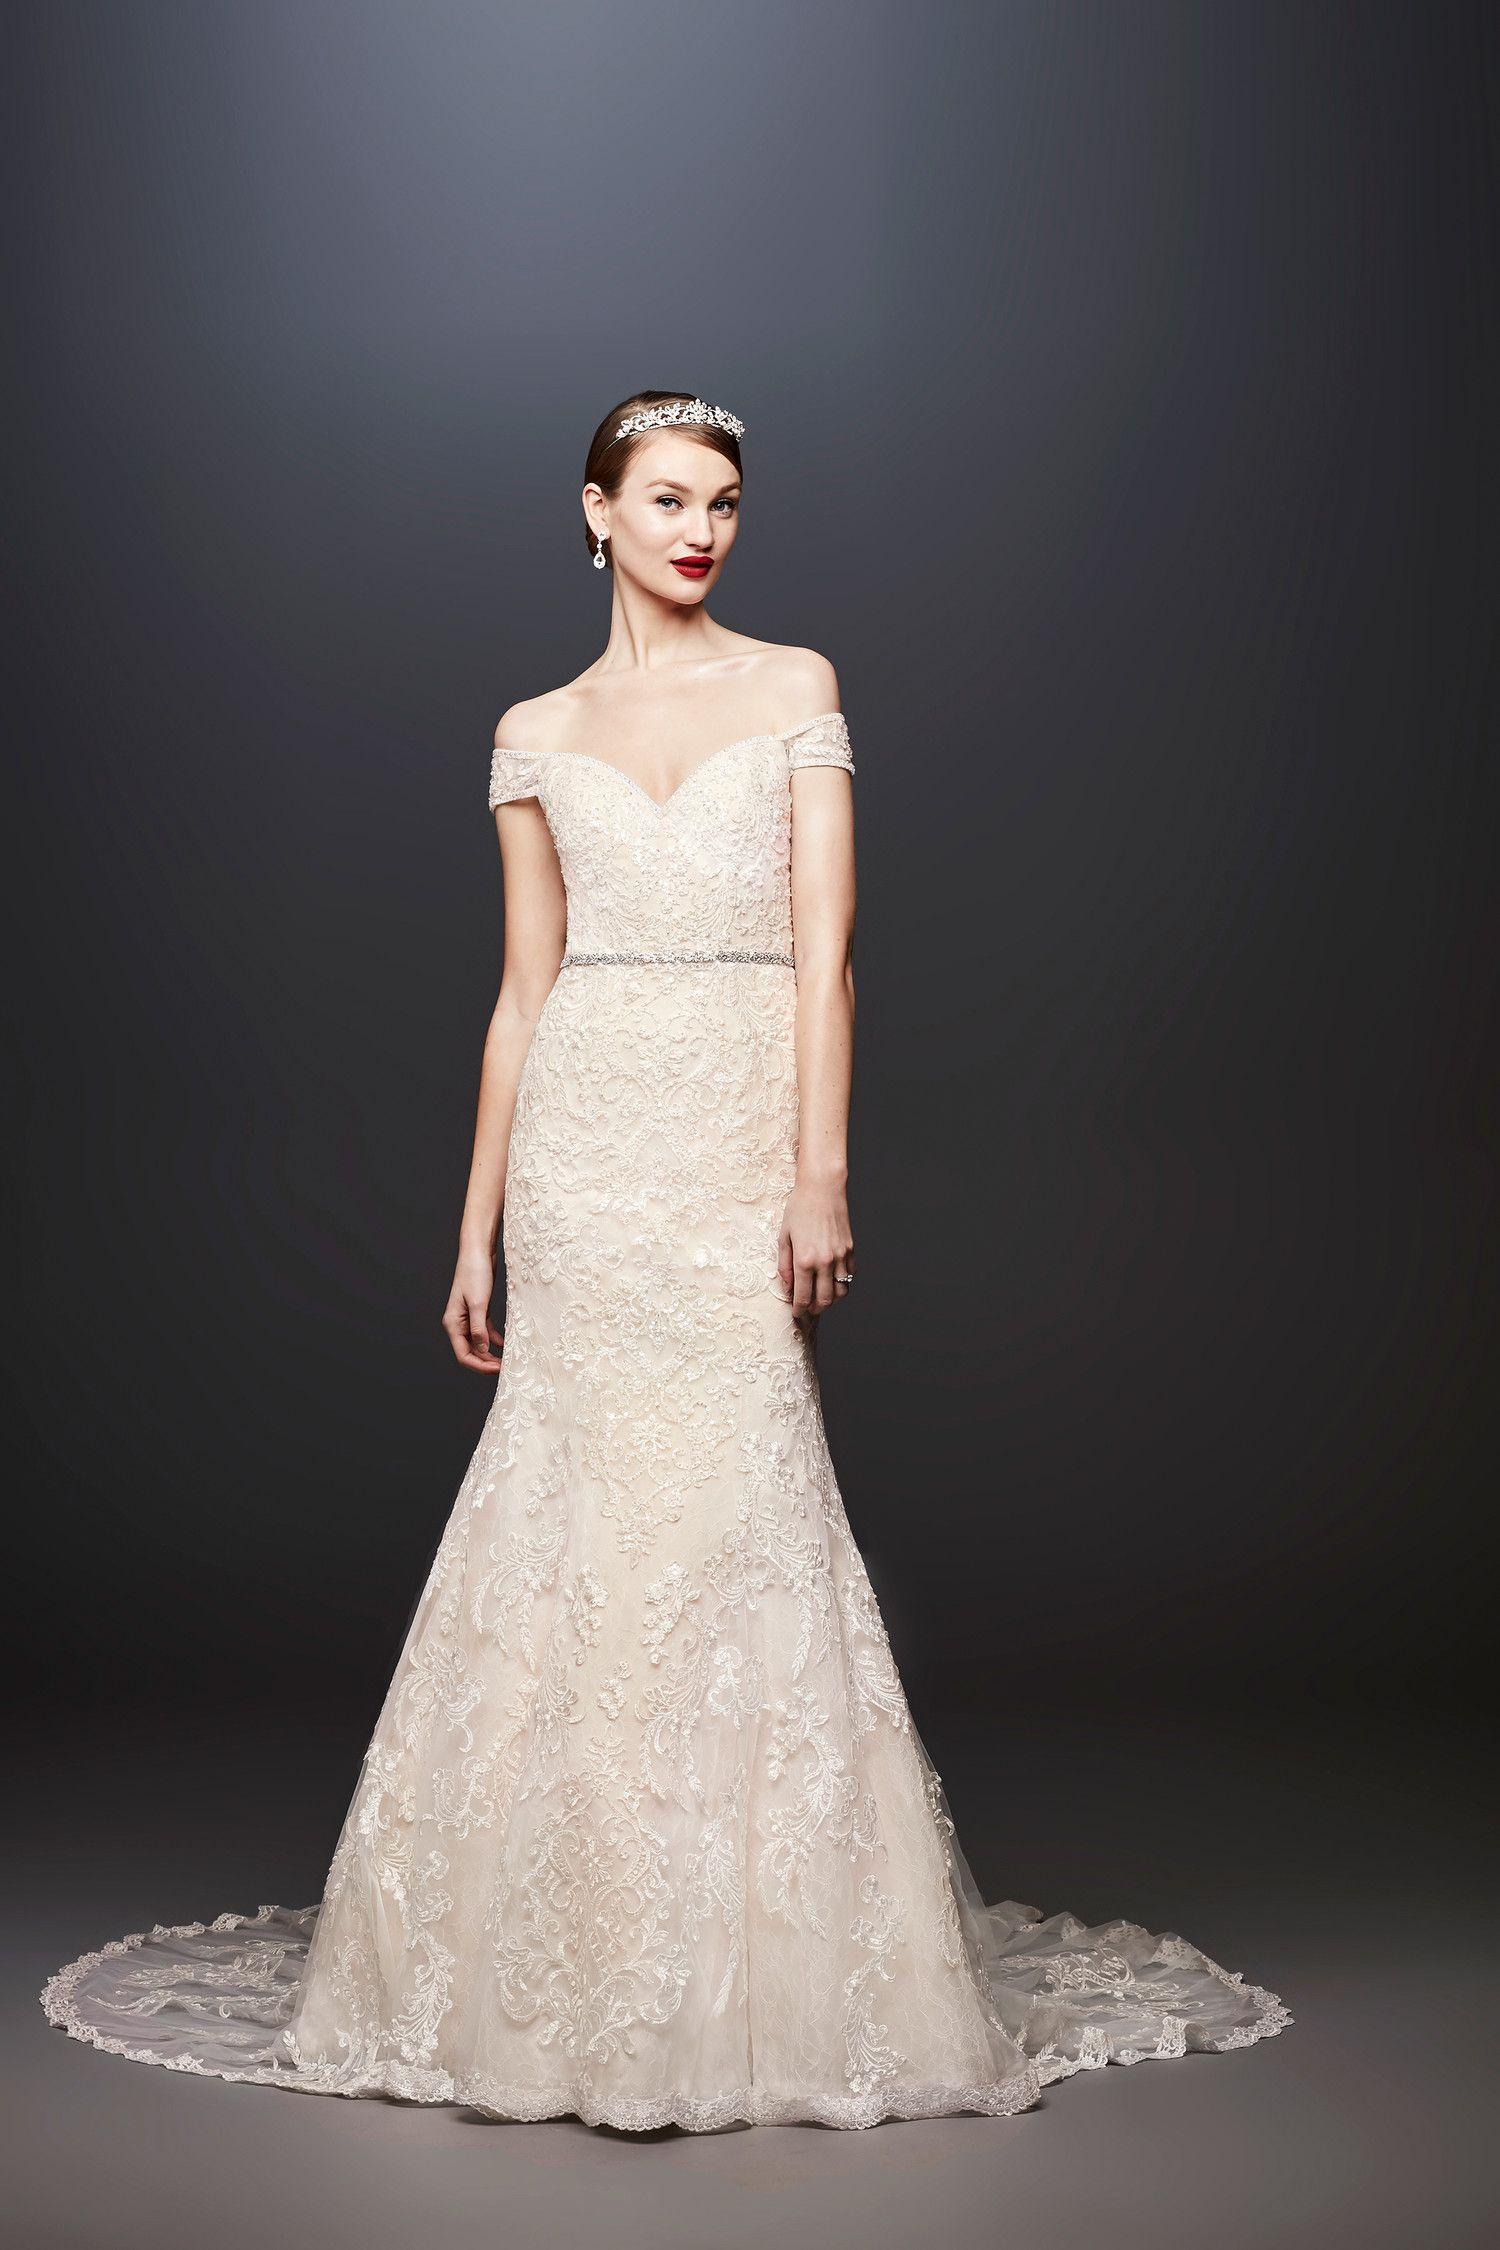 David\'s Bridal Fall 2018 Wedding Dress Collection | Wedding dress ...